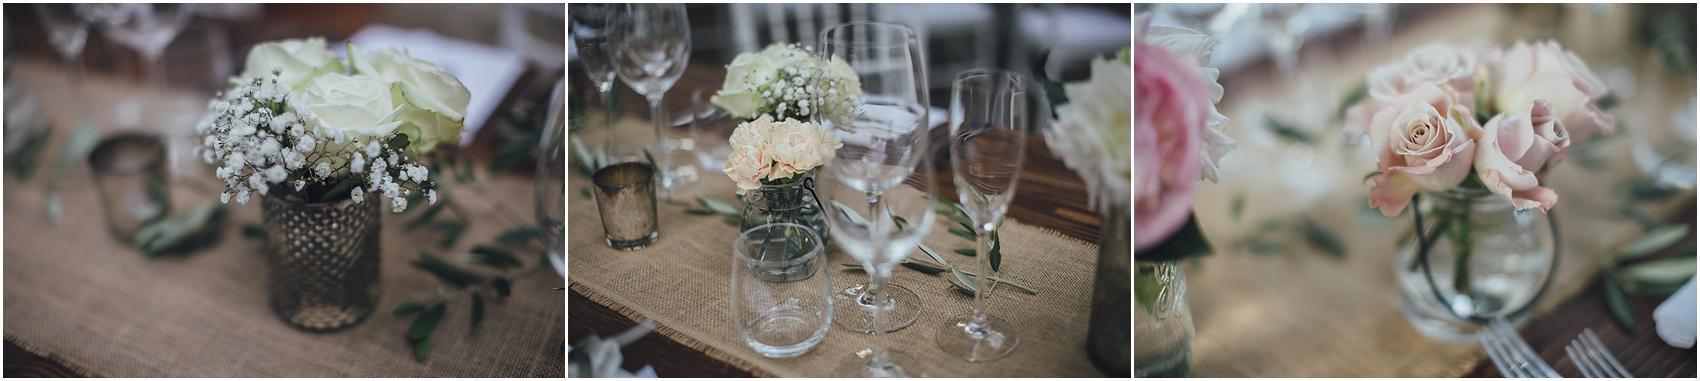 destination-wedding-photographer-tuscany_0167